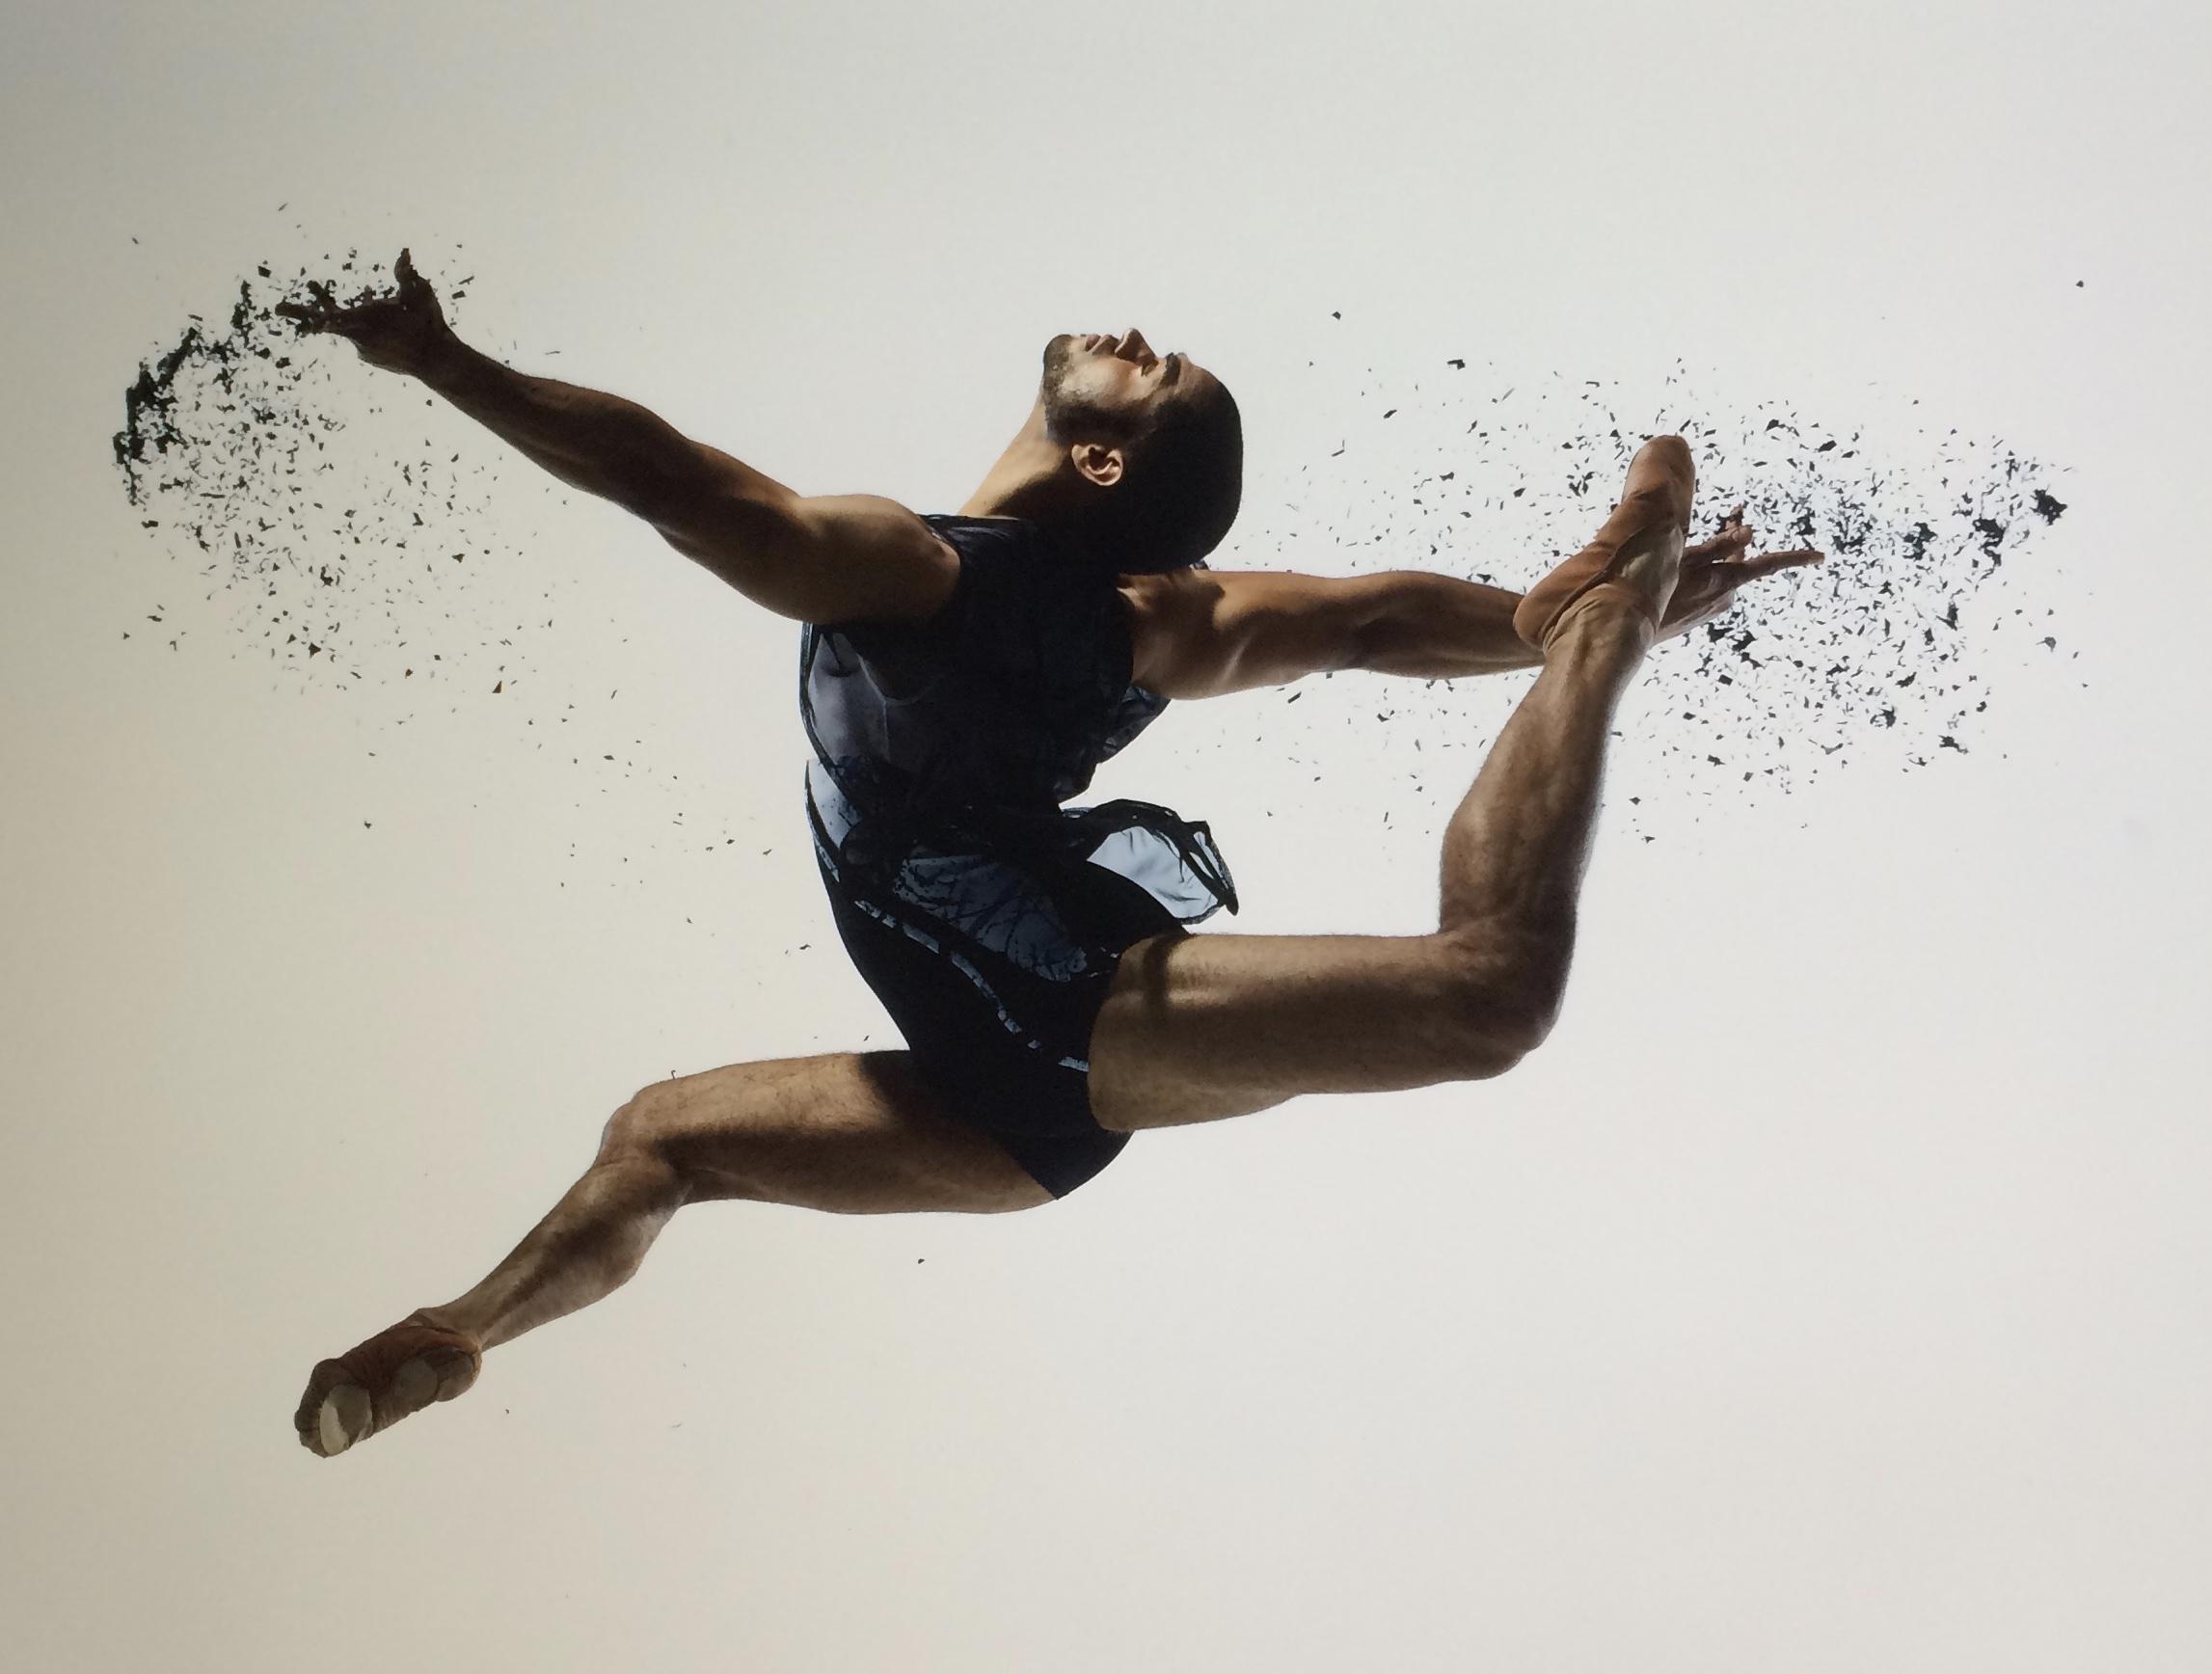 Amy Seiwert's Imagery, July 2016. Dancers: James Gilmer. Photo: David DeSilva